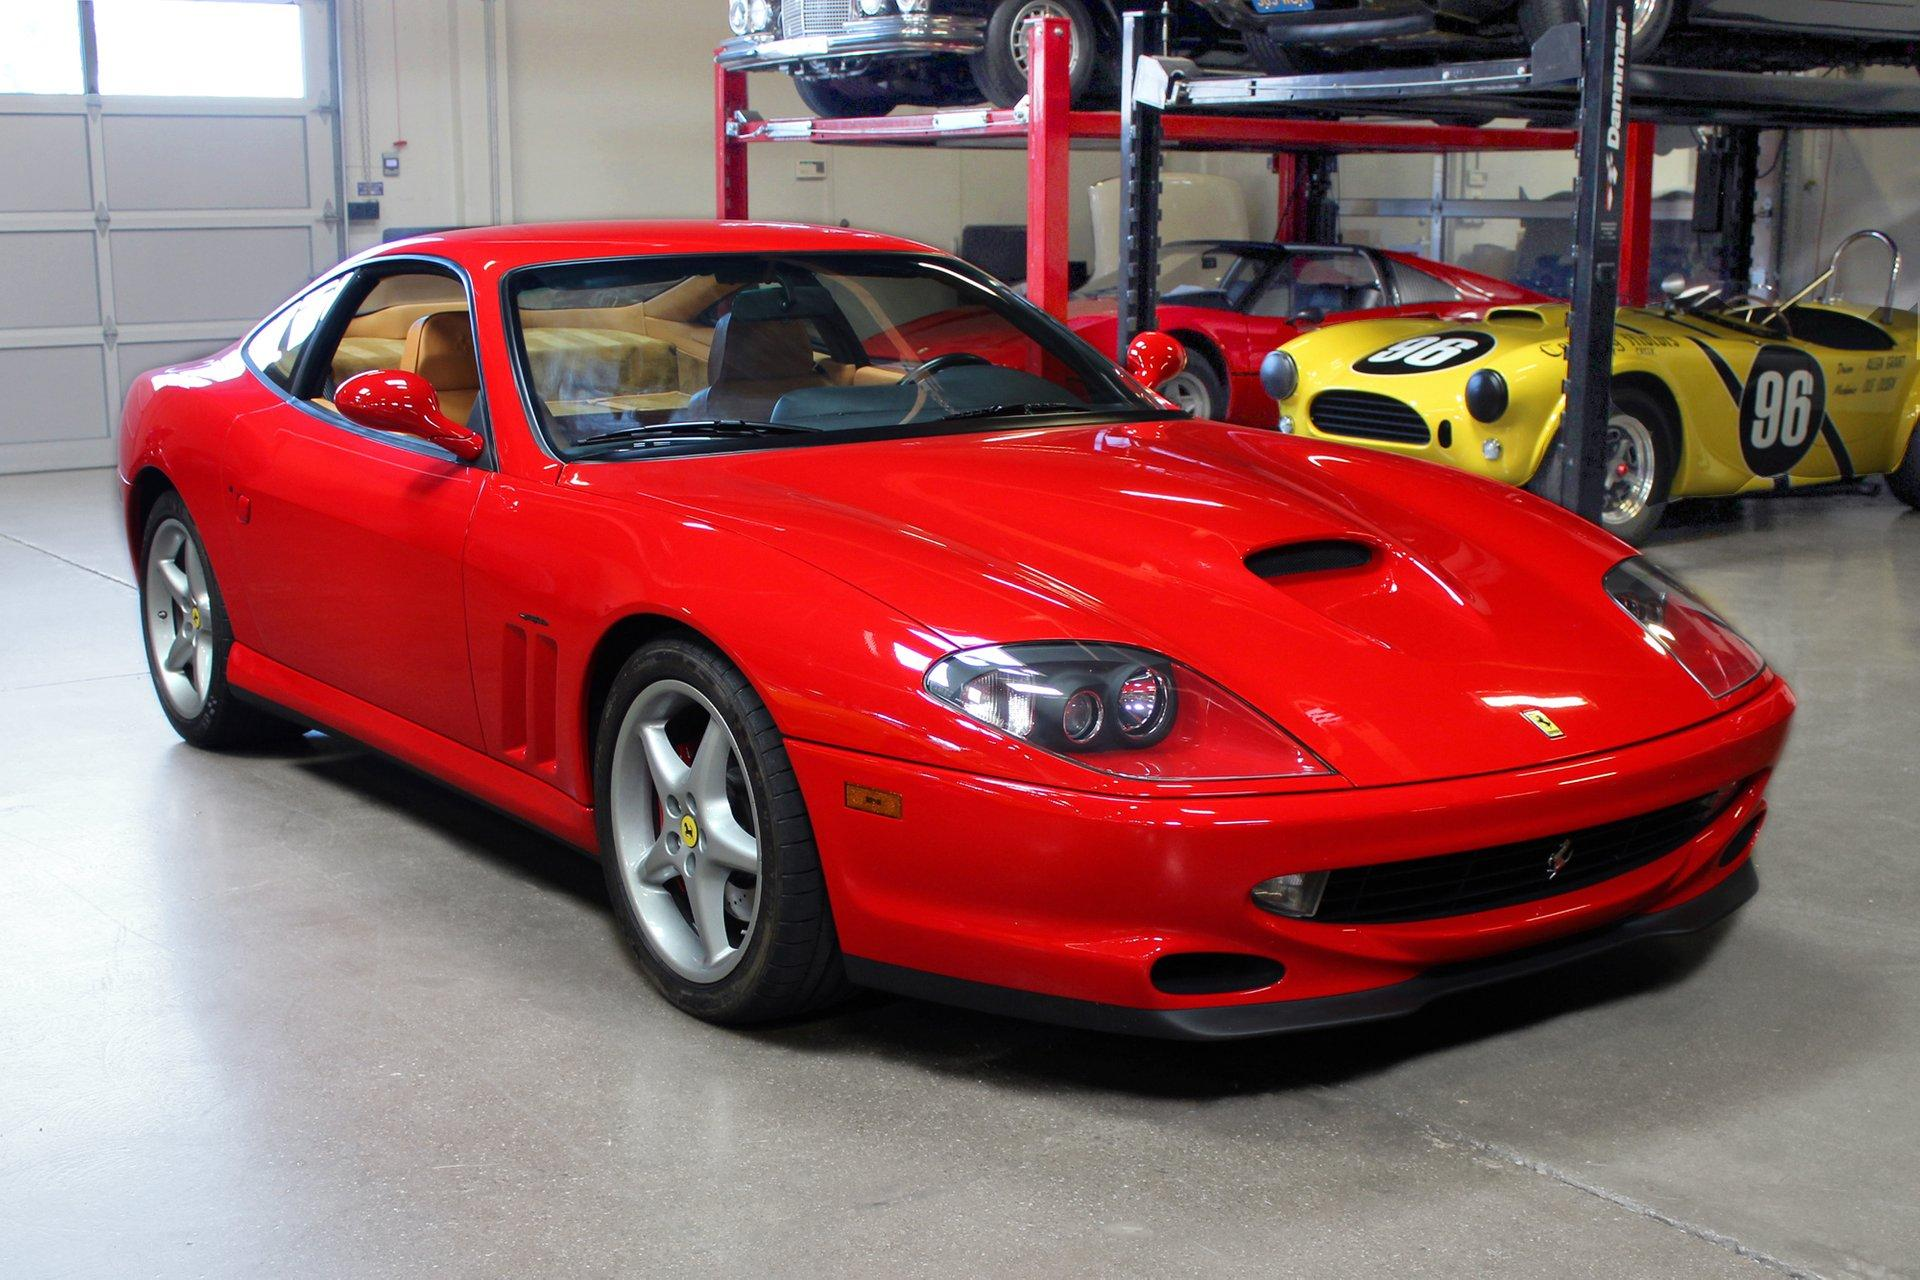 Used 2001 Ferrari 550 Maranello for sale Sold at San Francisco Sports Cars in San Carlos CA 94070 1